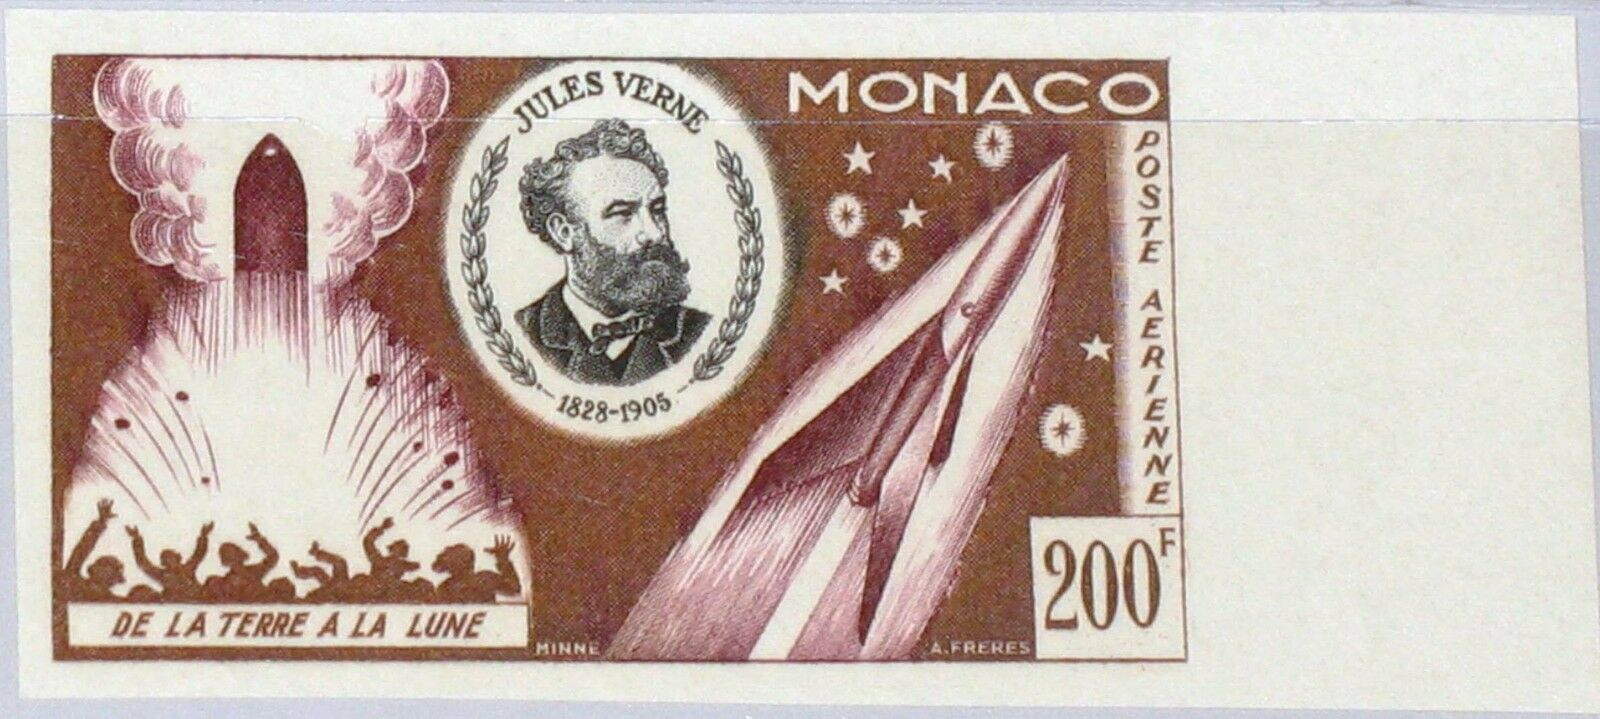 Monaco - Scott #C45 (1955) color trial proof